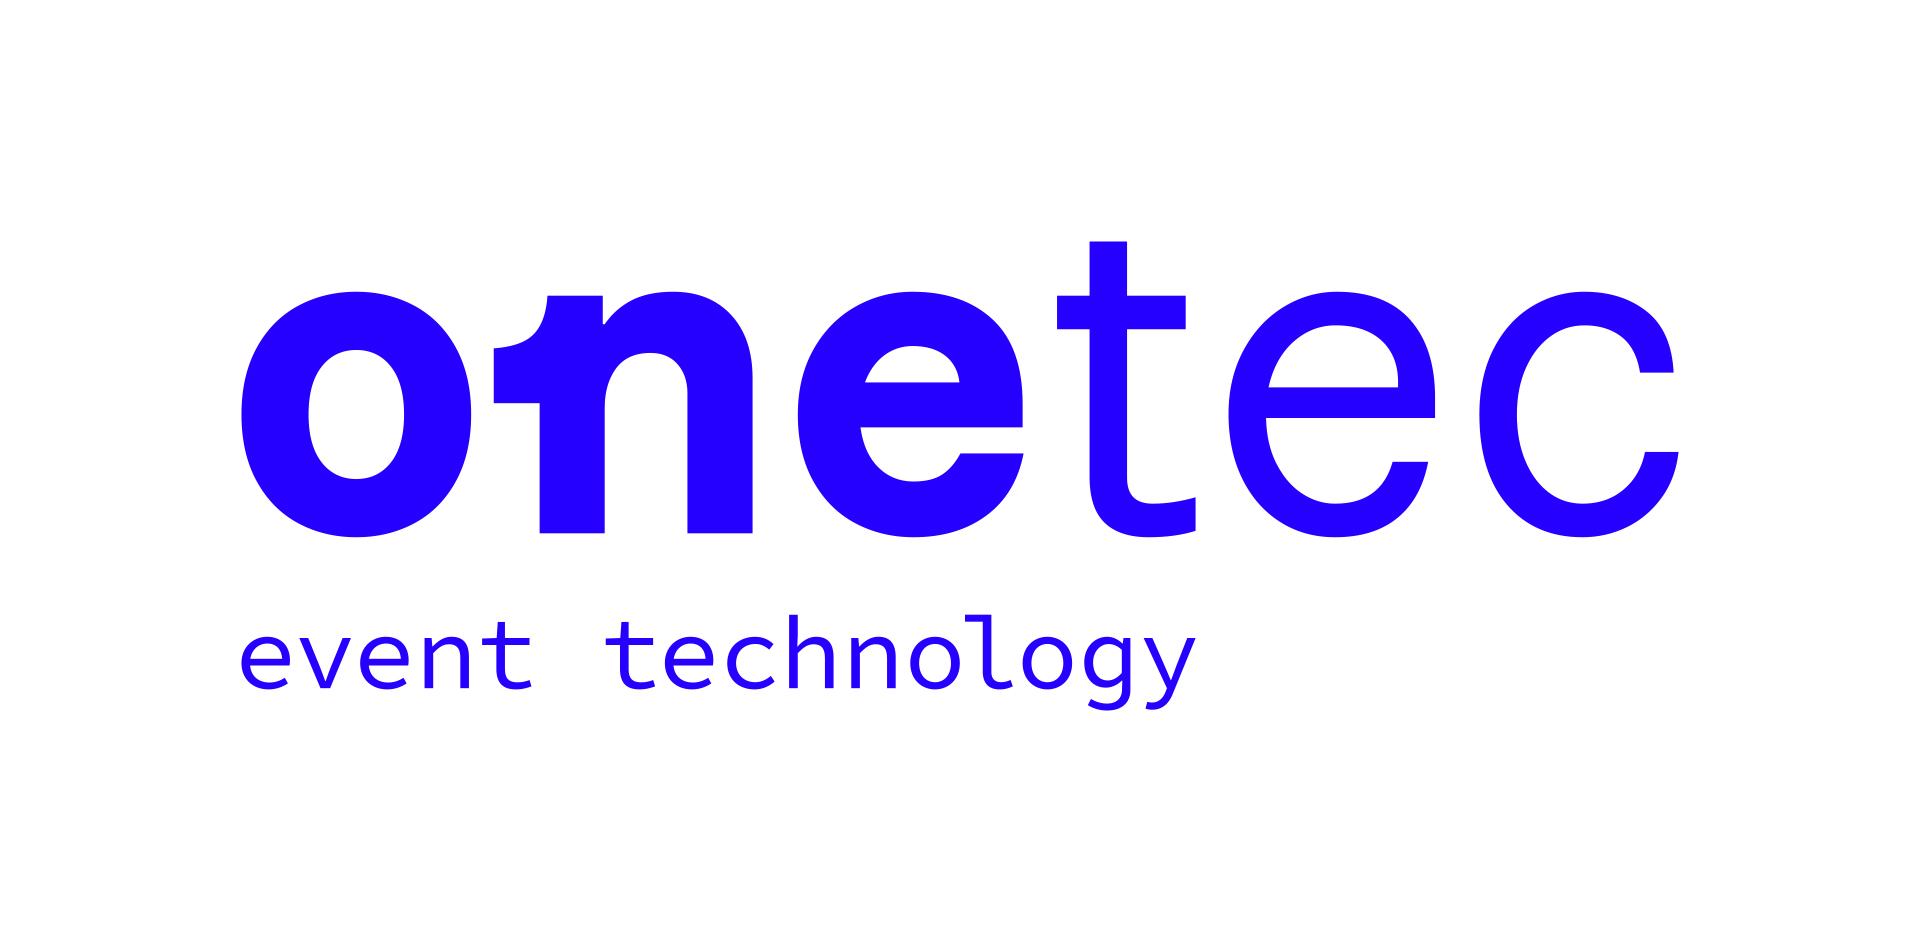 Onetec_logo.jpg